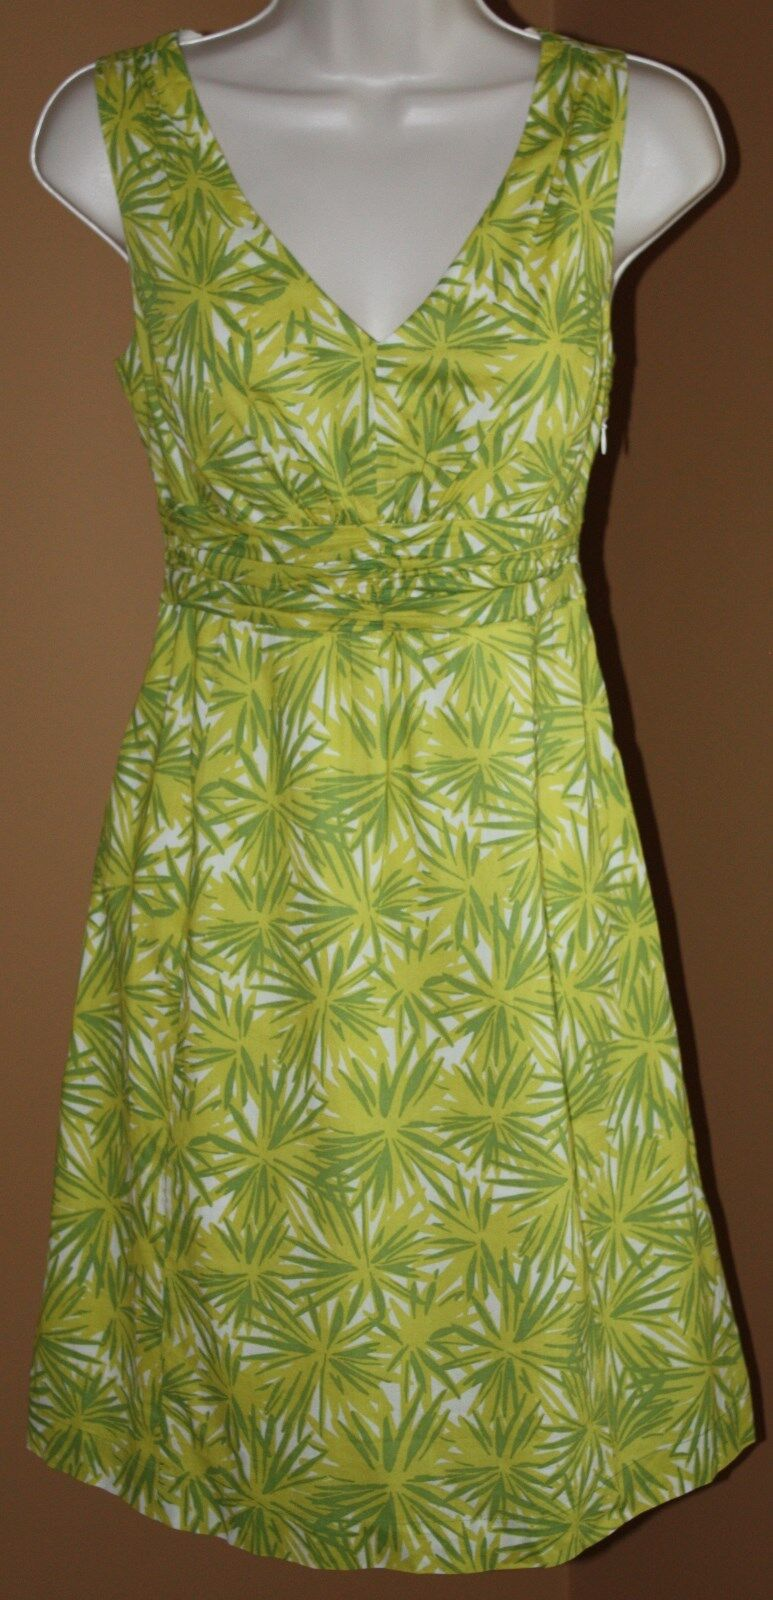 BODEN Chartreuse Grün Starburst Floral Sleevelesss Dress US 2P